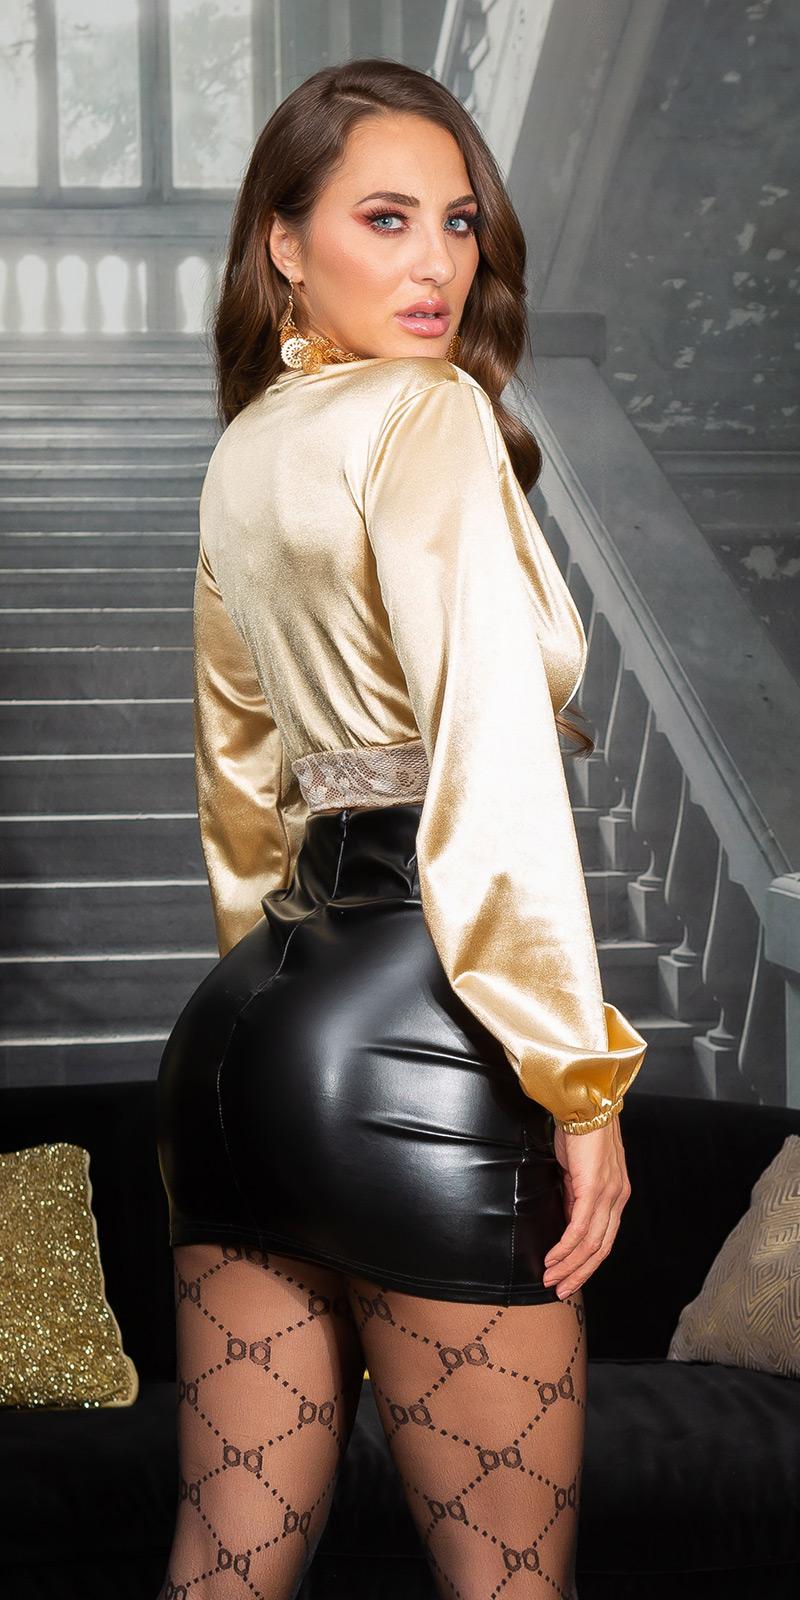 Topuri cu buricul gol sexy SatinLook cu dantela Detail